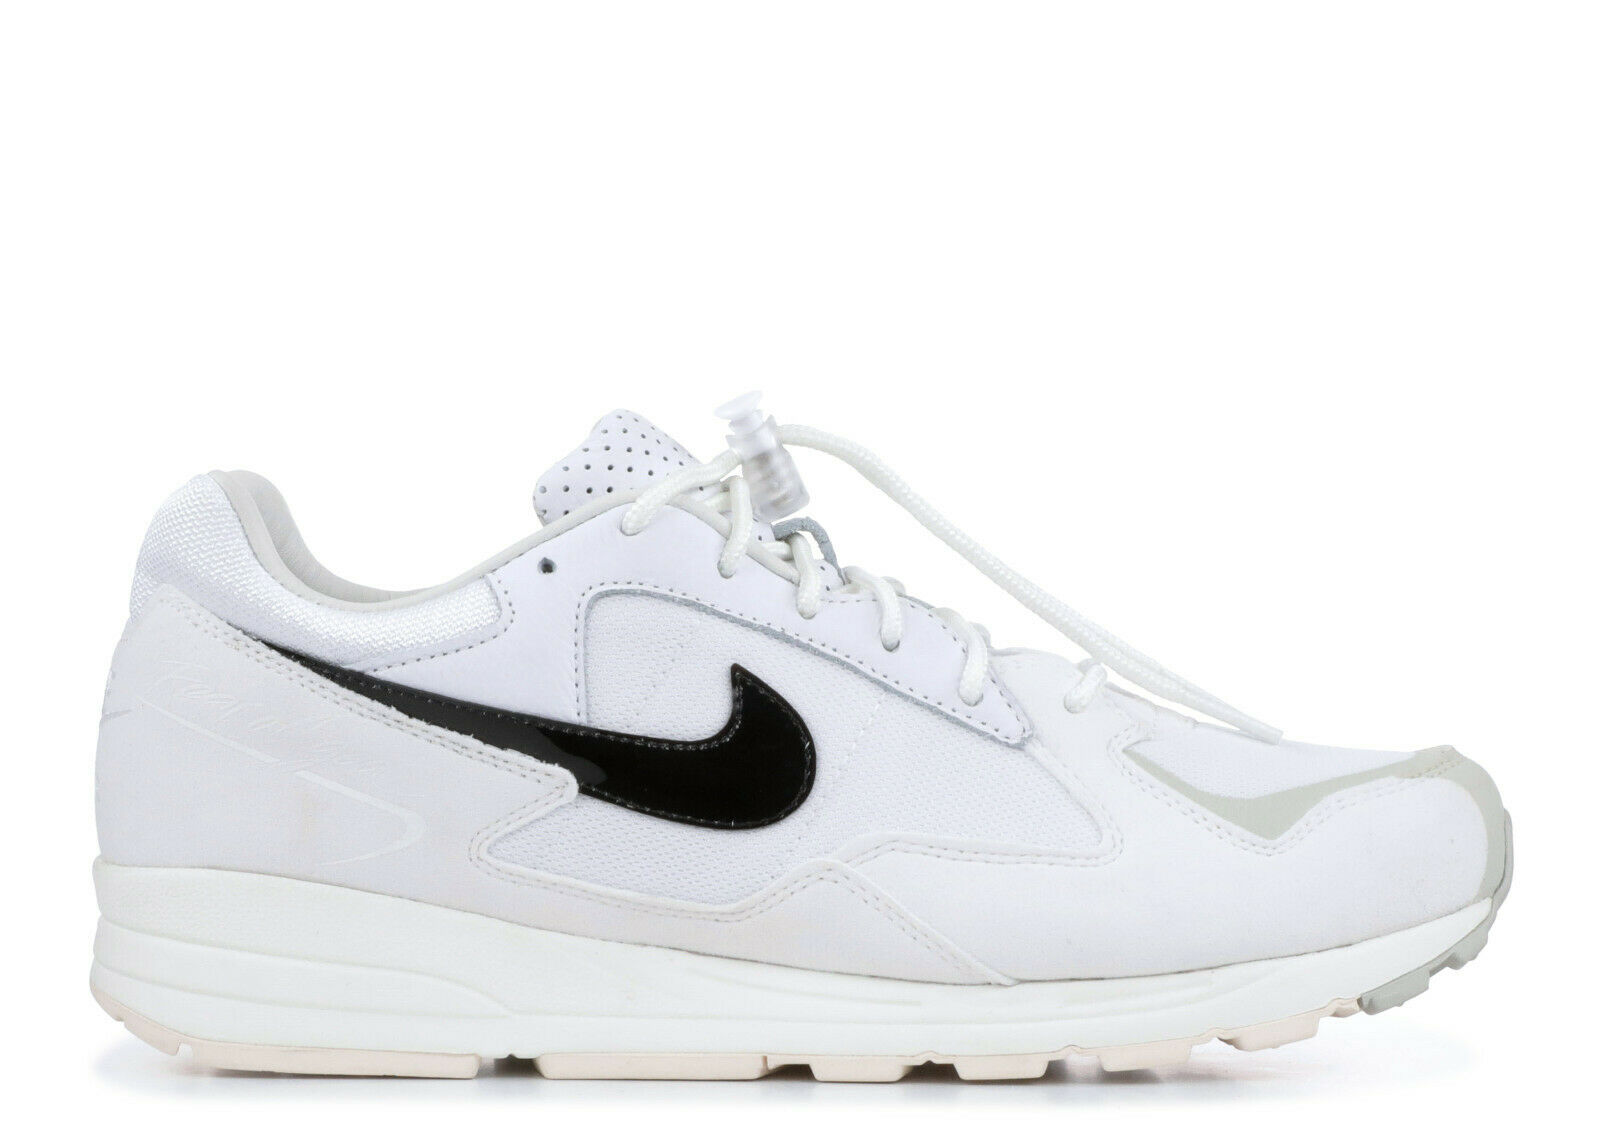 Men's Nike Air Skylon II X Fear Of God Athletic Fashion Sneakers BQ2752100